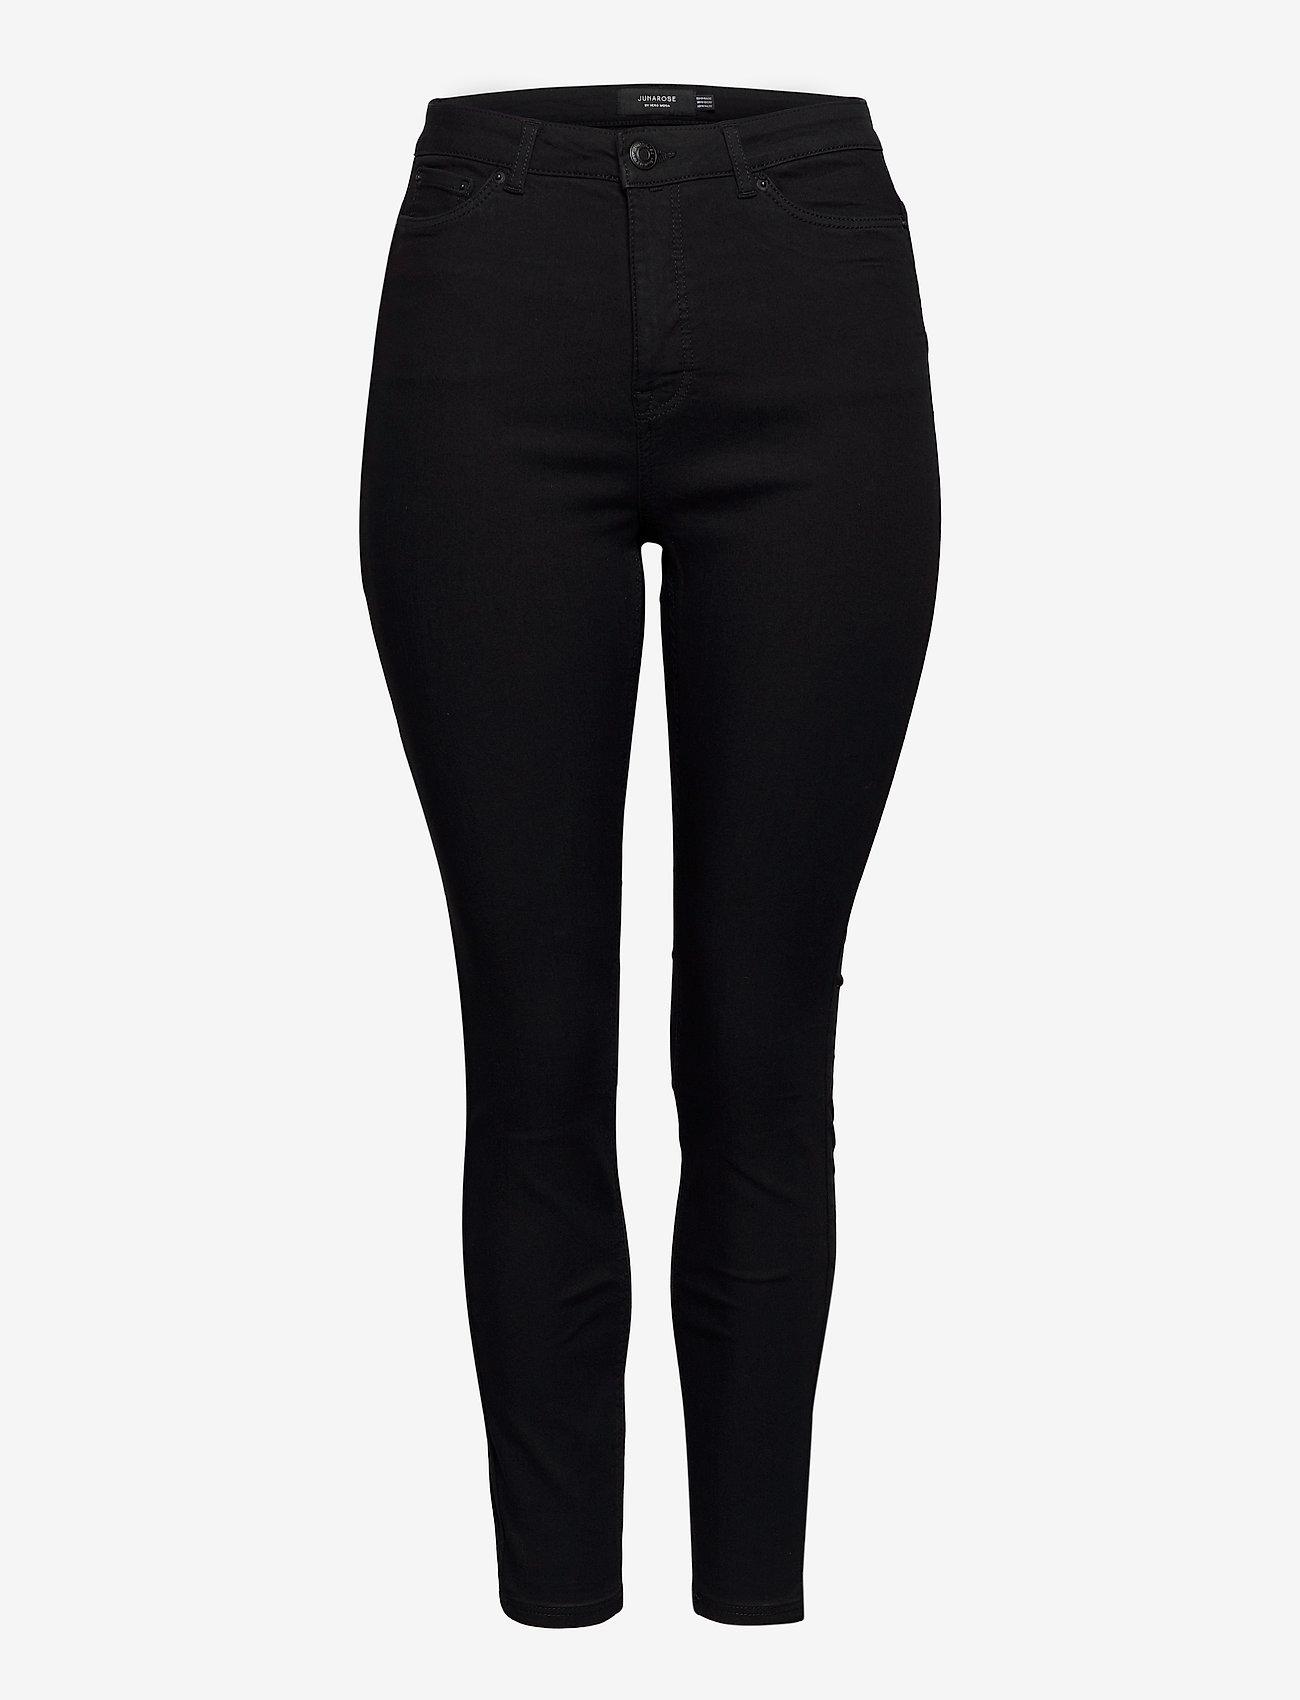 JunaRose - JRZEROTANJA SL BLACK JEANS - K NOOS - slim jeans - black - 0